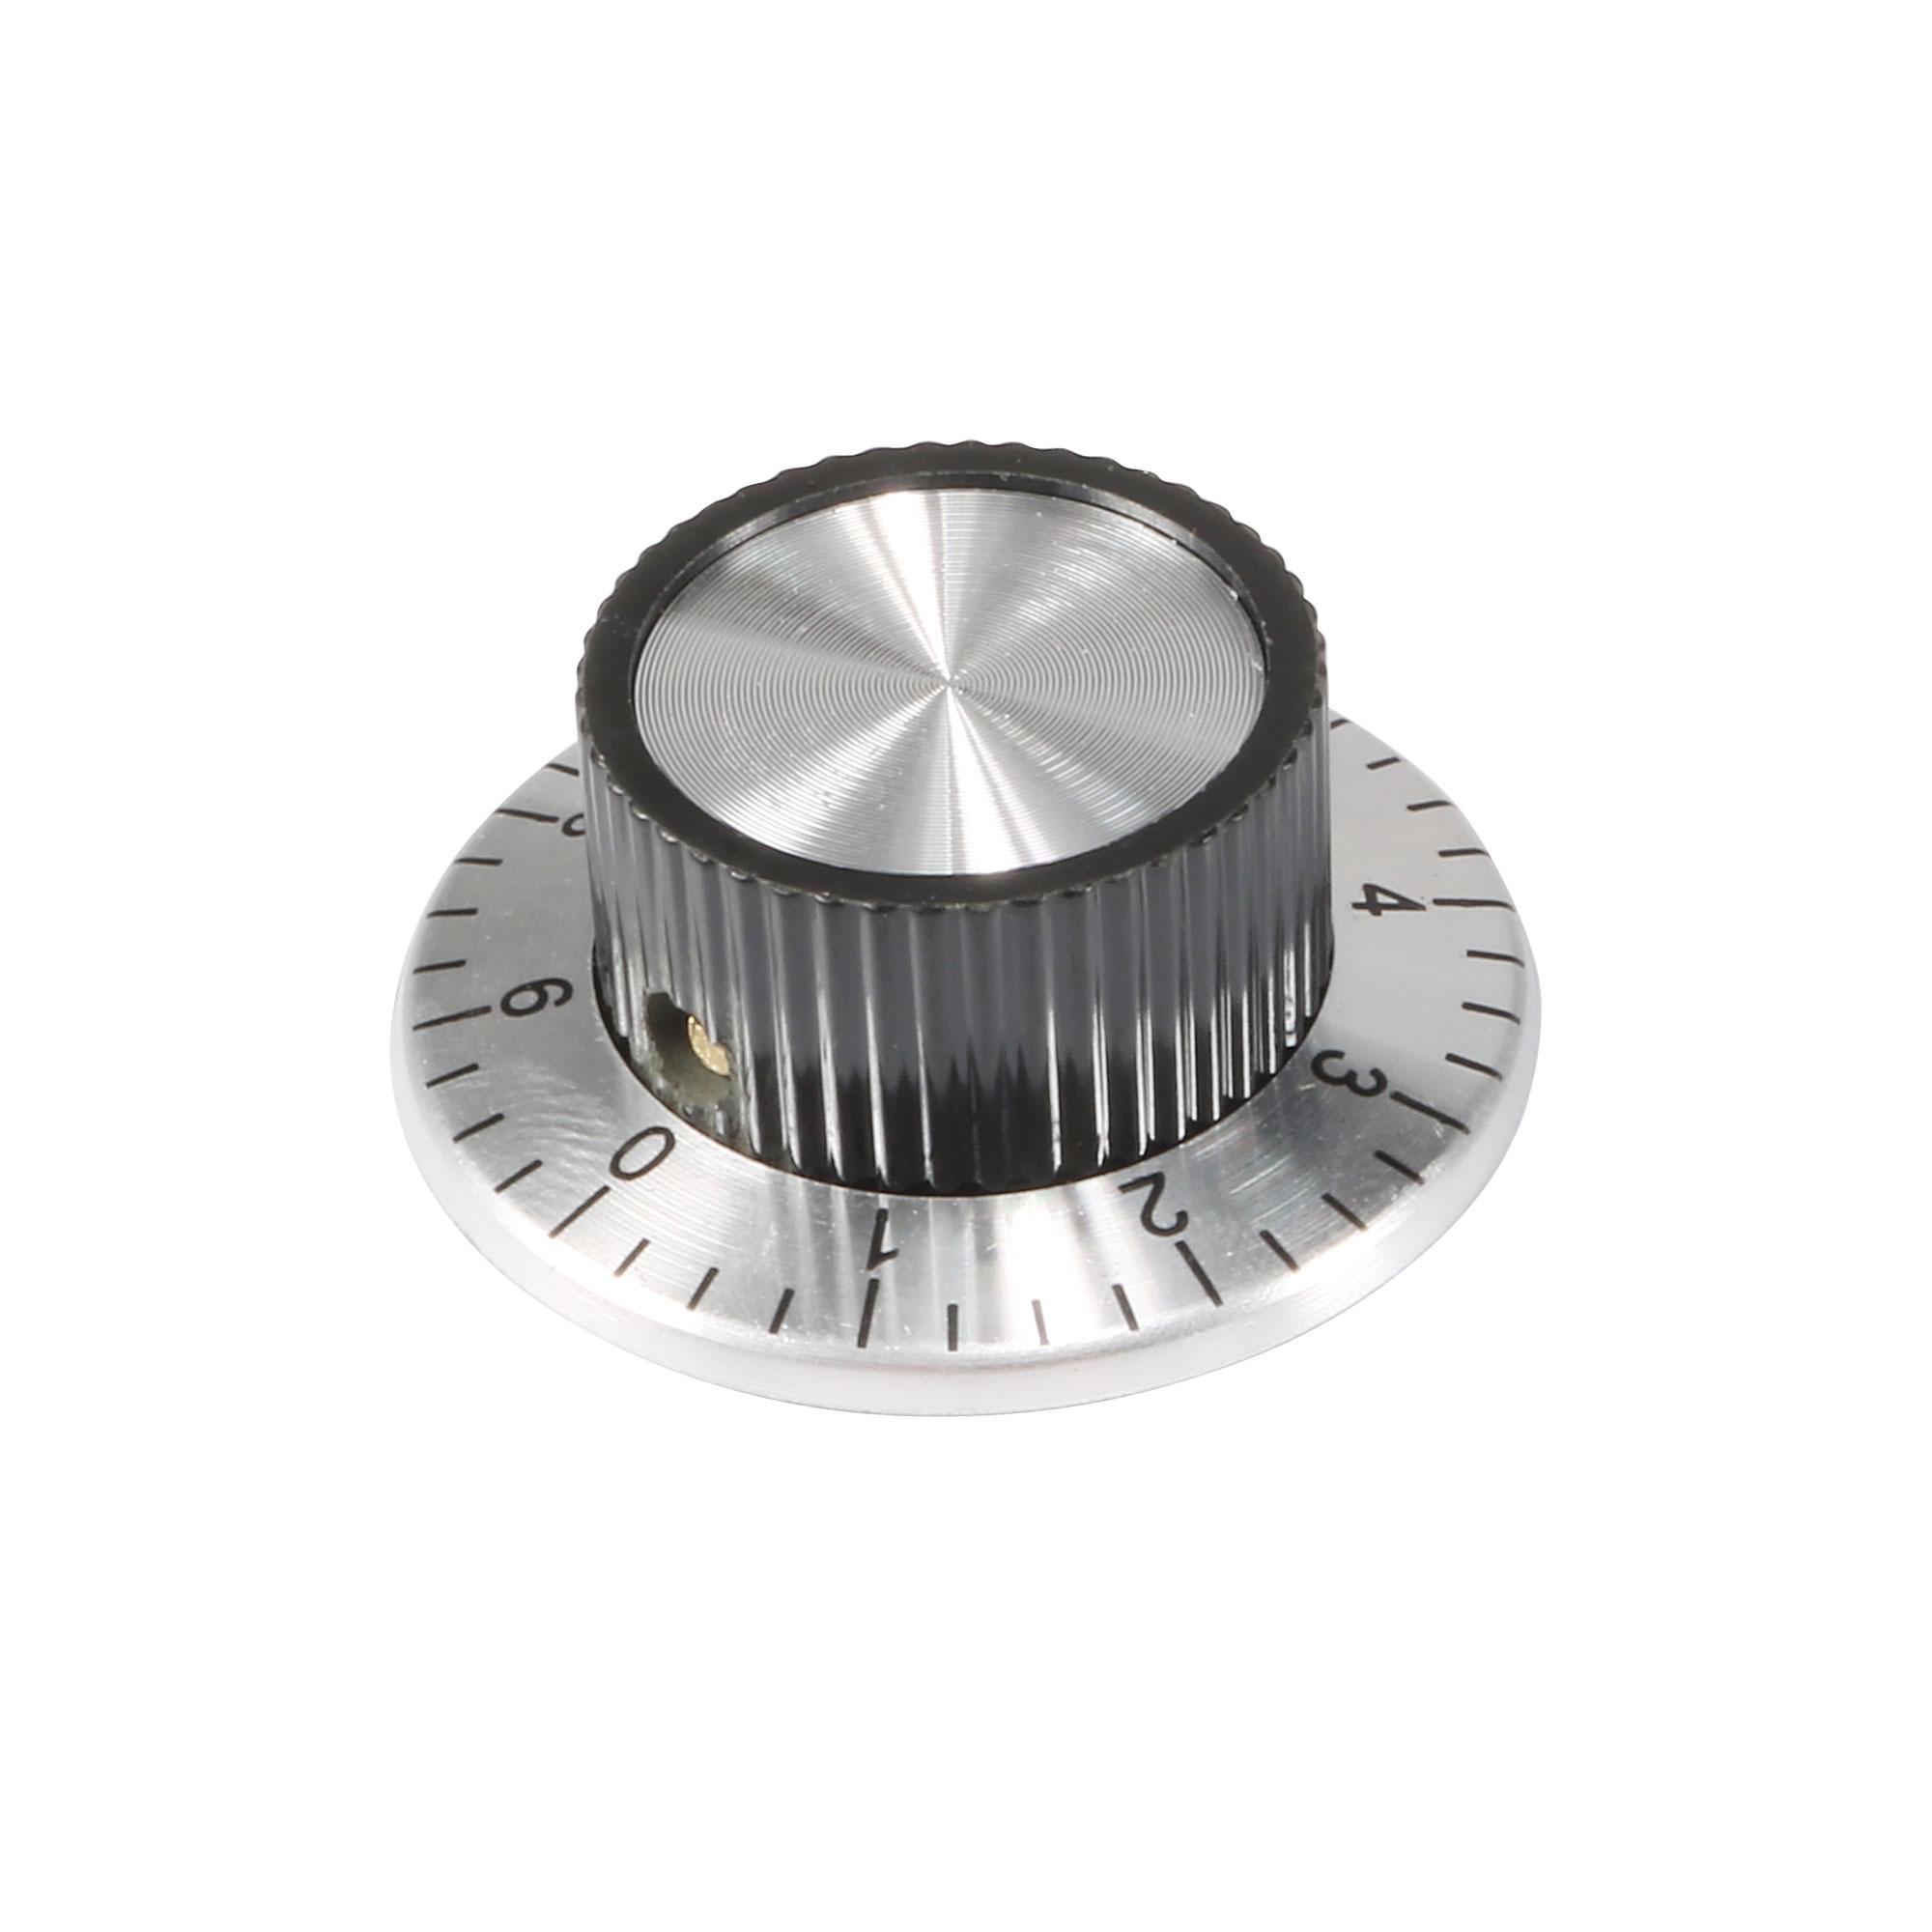 36mmx15mm Aluminum Potentiometer Control Volume Rotary Digital Knob Cap